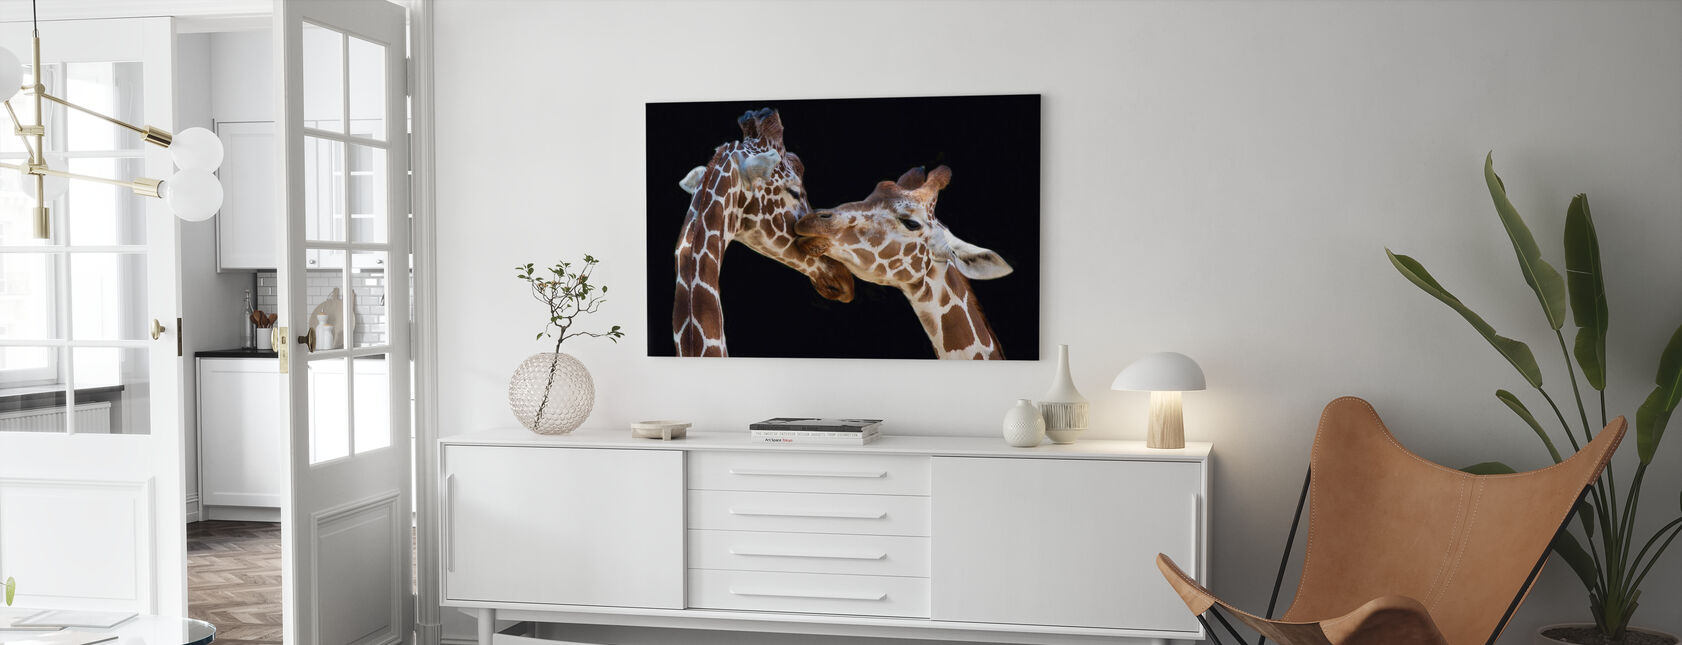 Giraffes Kissing - Canvas print - Living Room